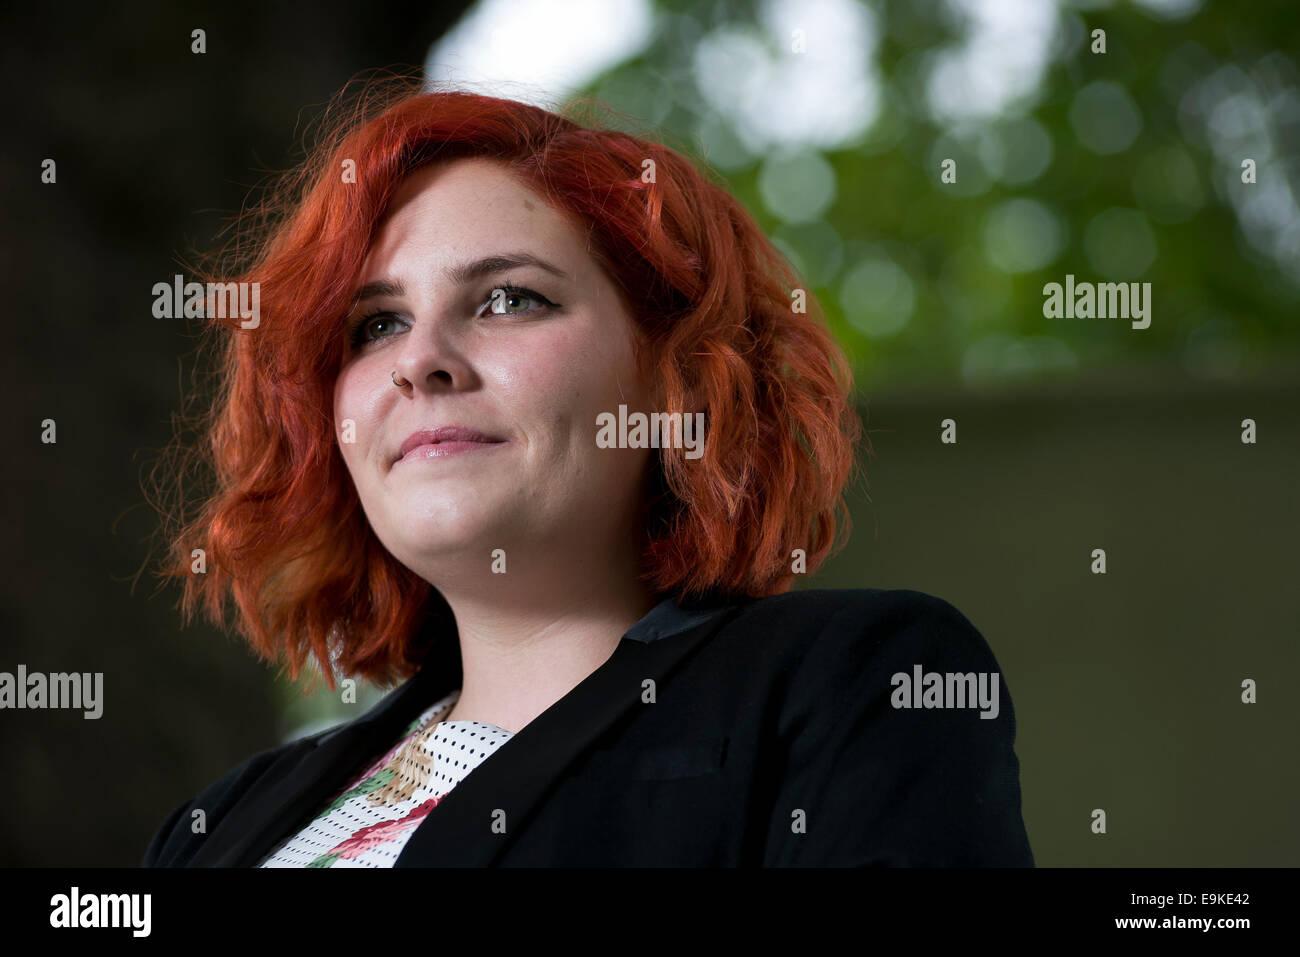 Poet Molly Vogel appears at the Edinburgh International Book Festival. - Stock Image